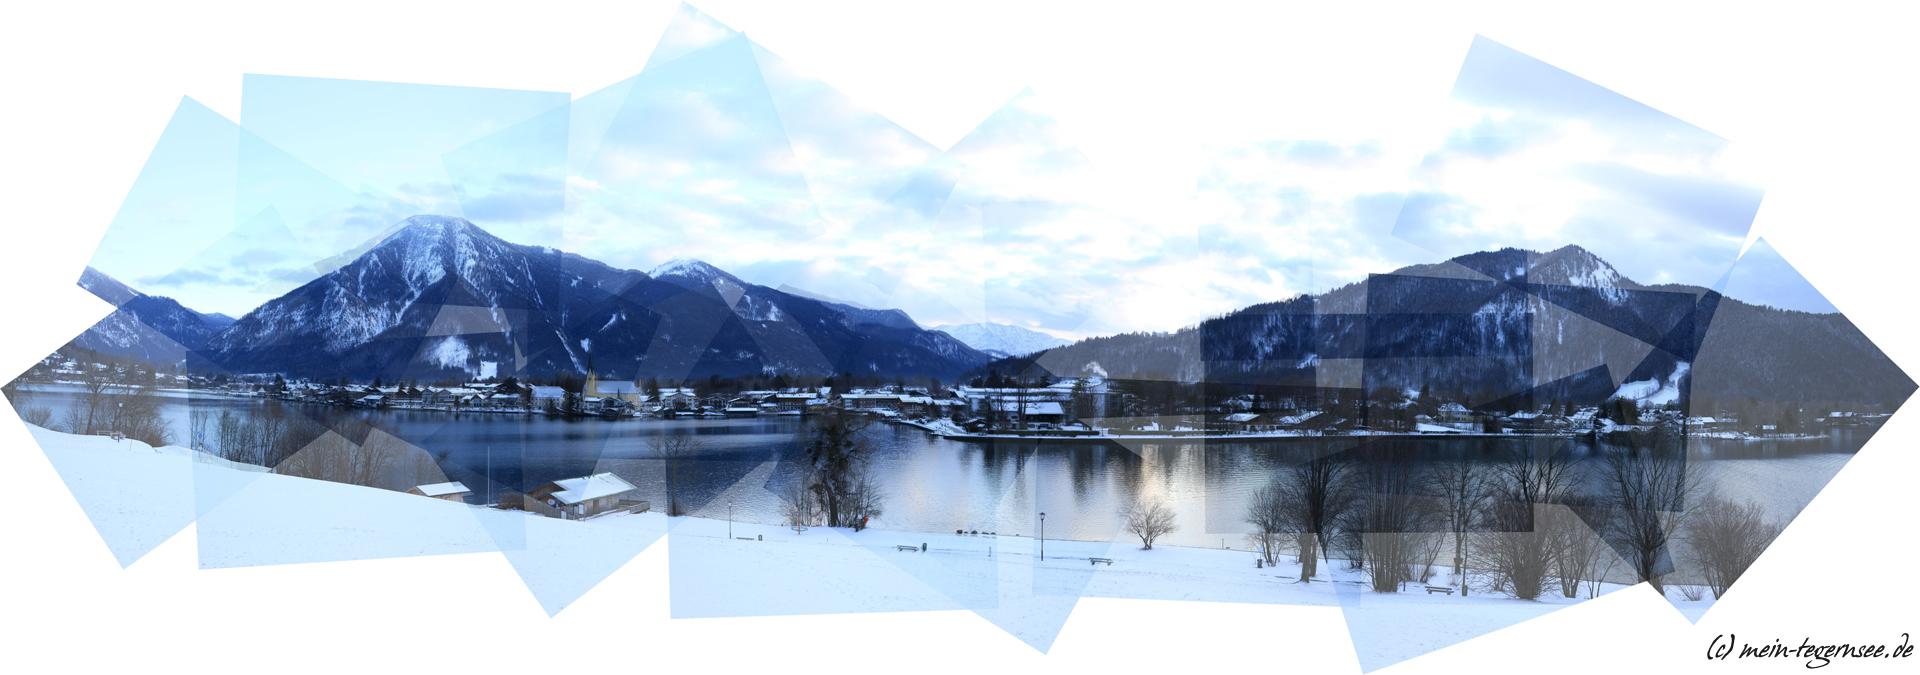 Panografie-Collage der Egerner Bucht am Tegernsee